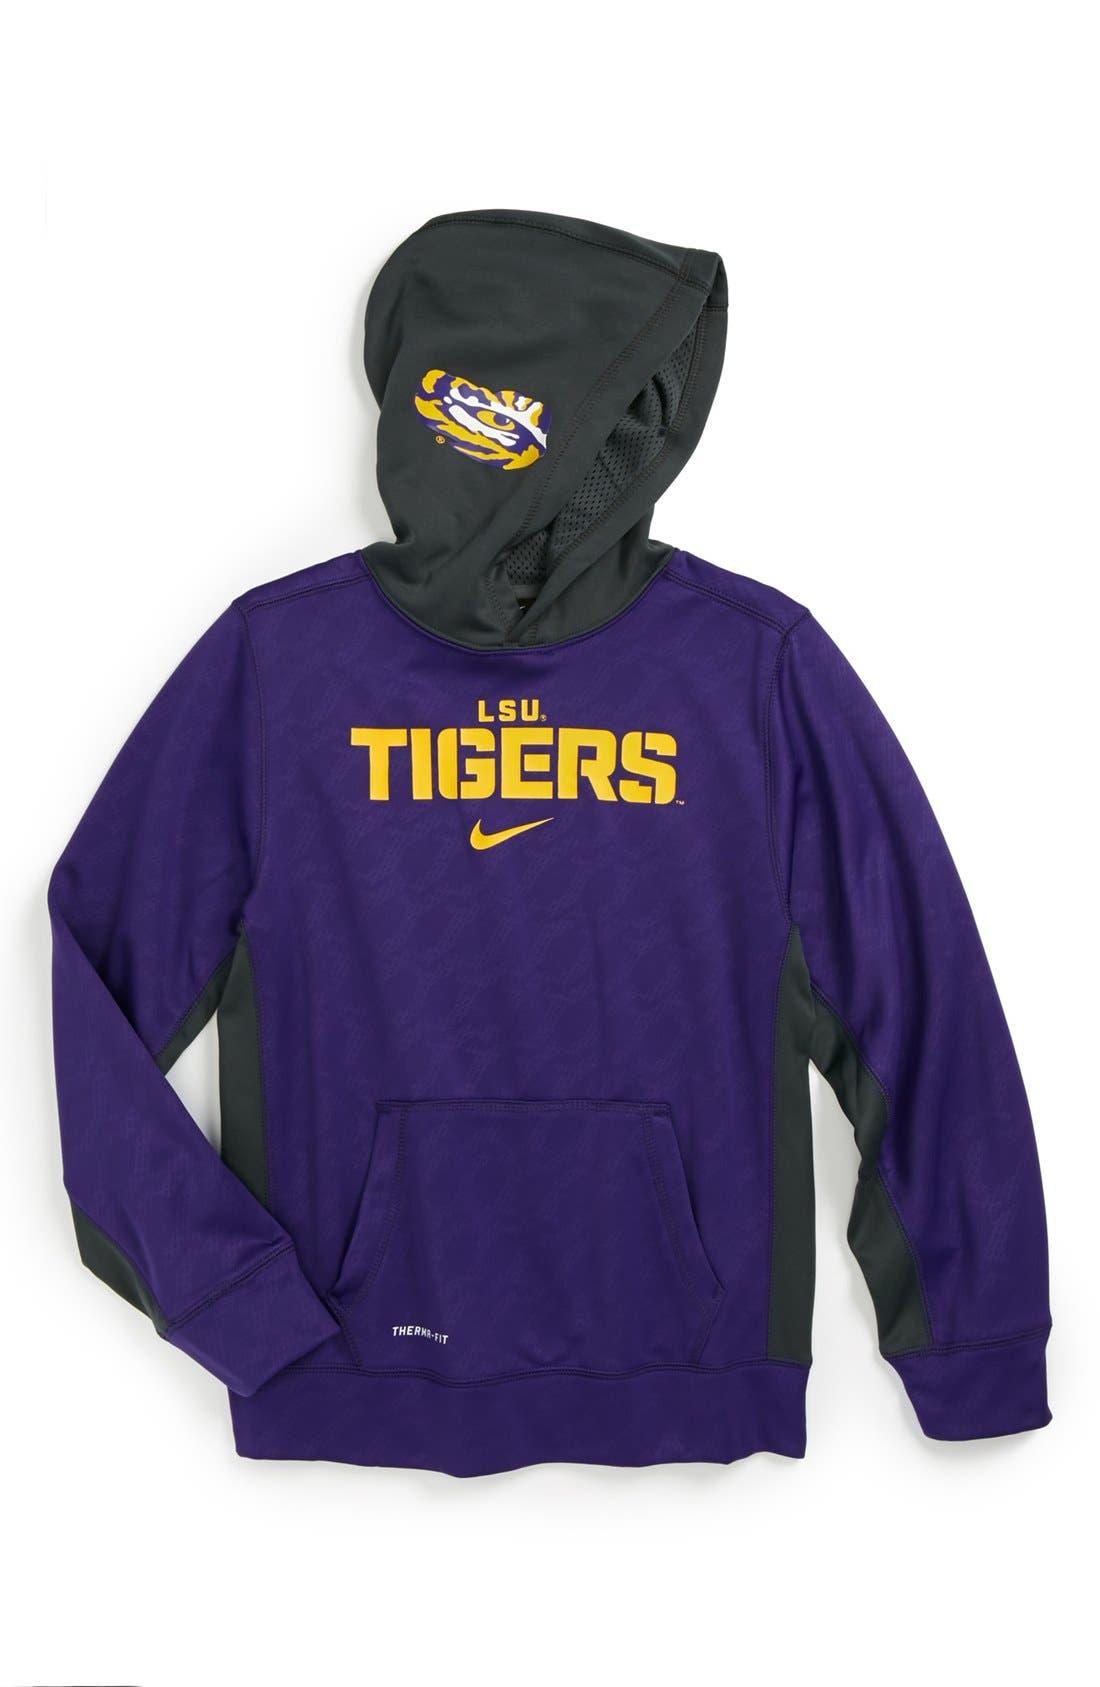 Alternate Image 1 Selected - Nike 'LSU Tigers' Therma-FIT Pullover Hoodie (Big Boys)